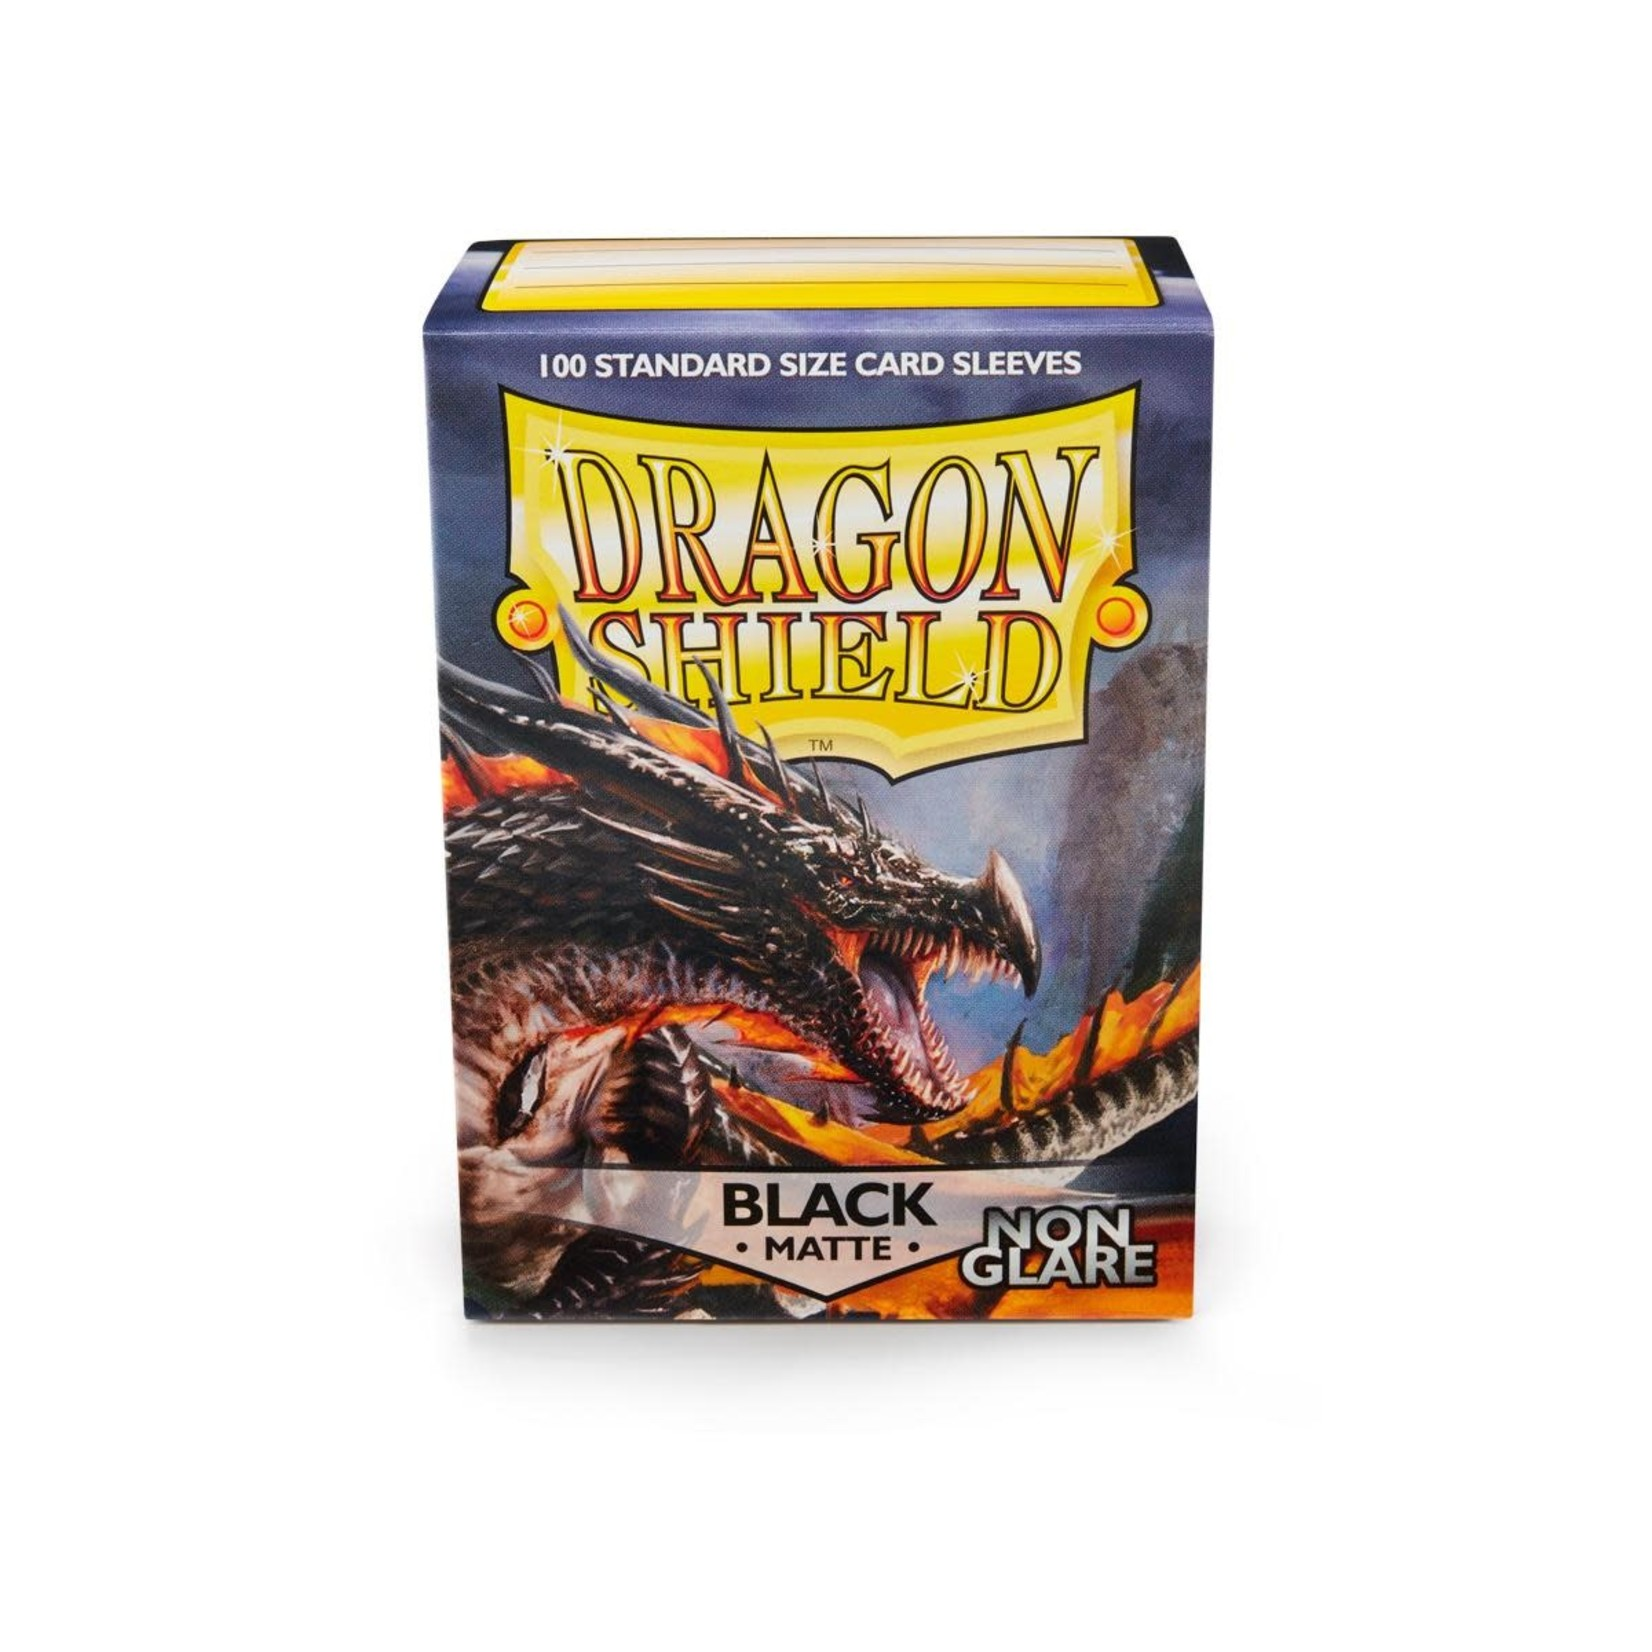 Arcane Tinman Dragon Shields: Card Sleeves - Black Non-Glare Matte (100)